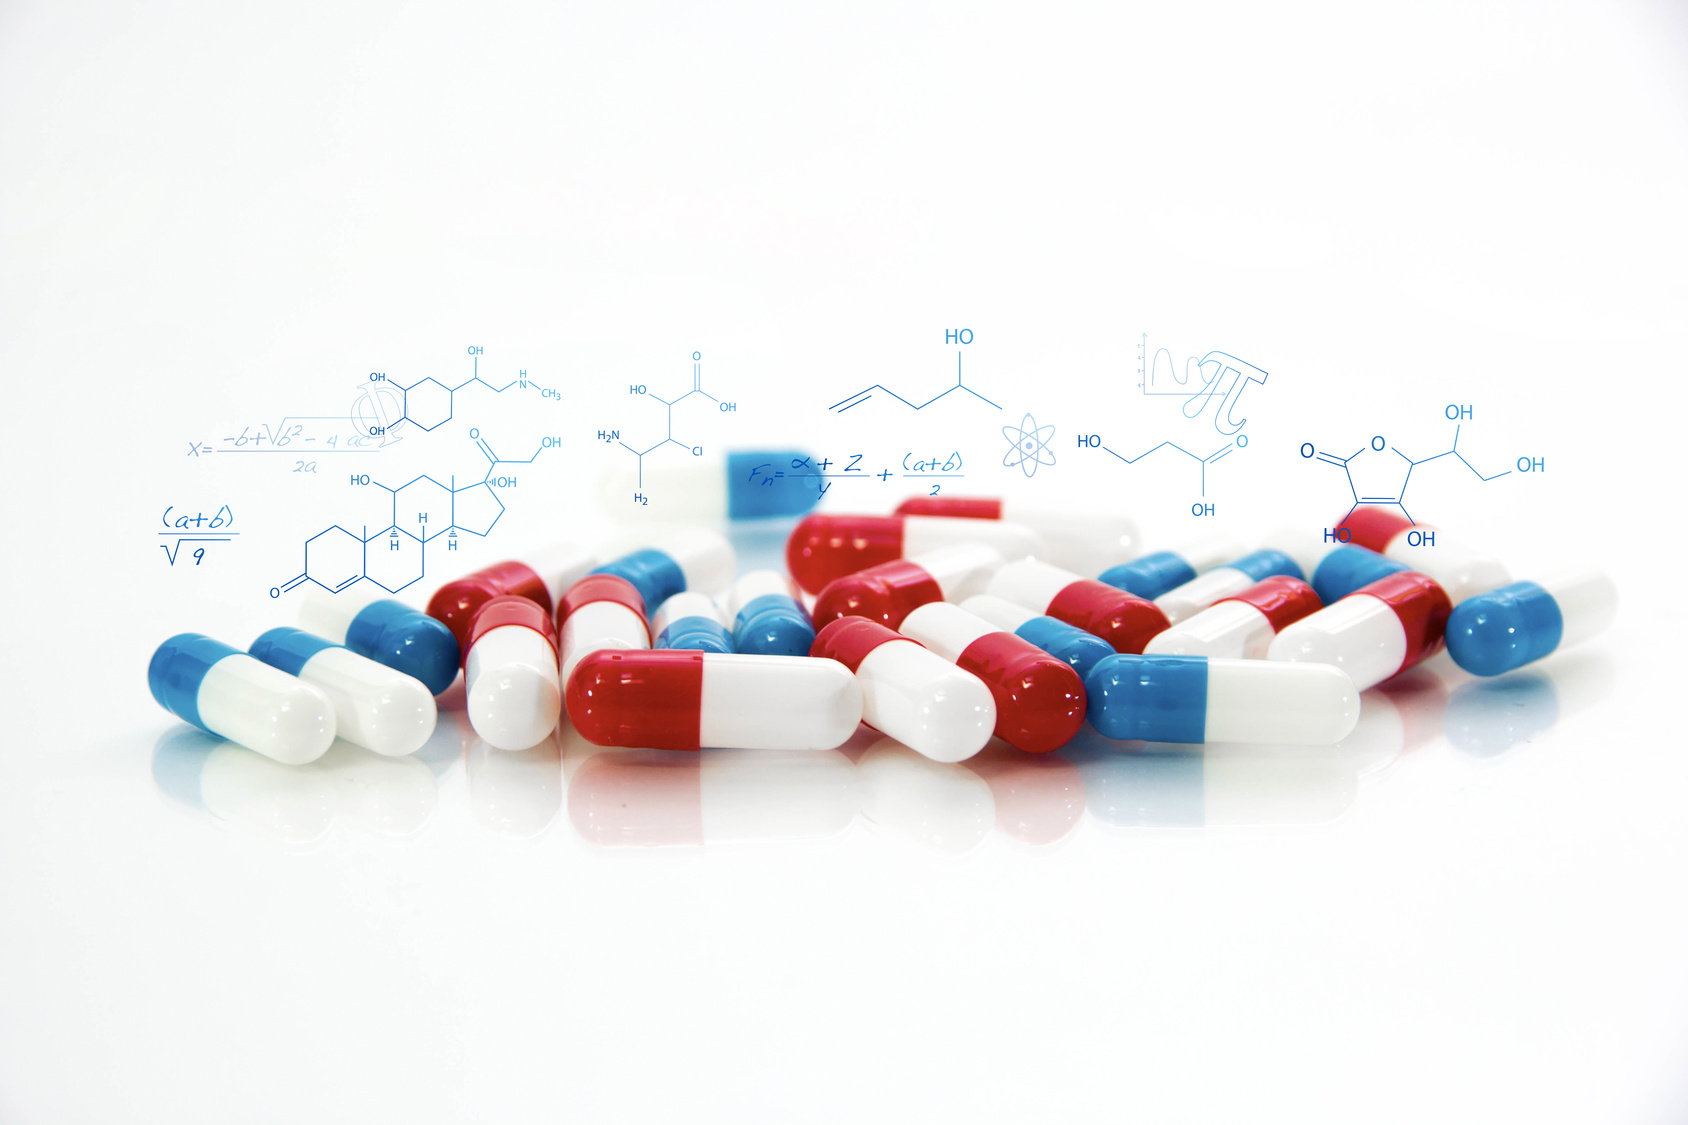 Fotolia_132239926_capsule, pillole, medicina, farmaco, farmaceutica_M